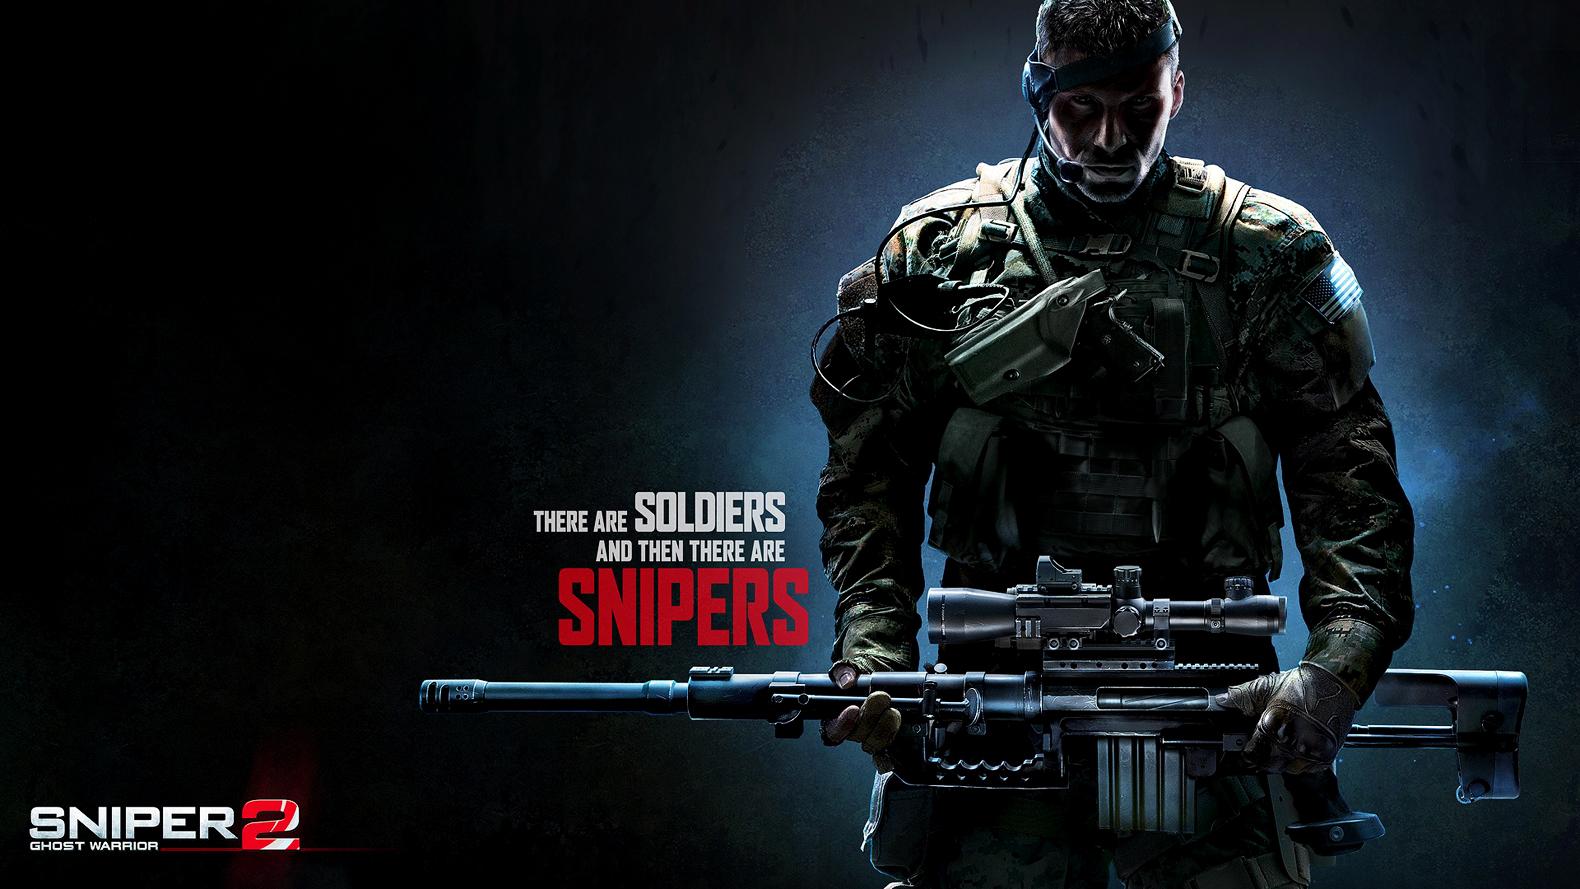 https://2.bp.blogspot.com/-K8fxG0Fxi6c/UKZ3RtPfljI/AAAAAAAAGIA/bu0zcOuPML8/s1600/Sniper-2-Ghost-Warrior-HD-Sniper-Wallpaper_Vvallpaper.Net.jpg